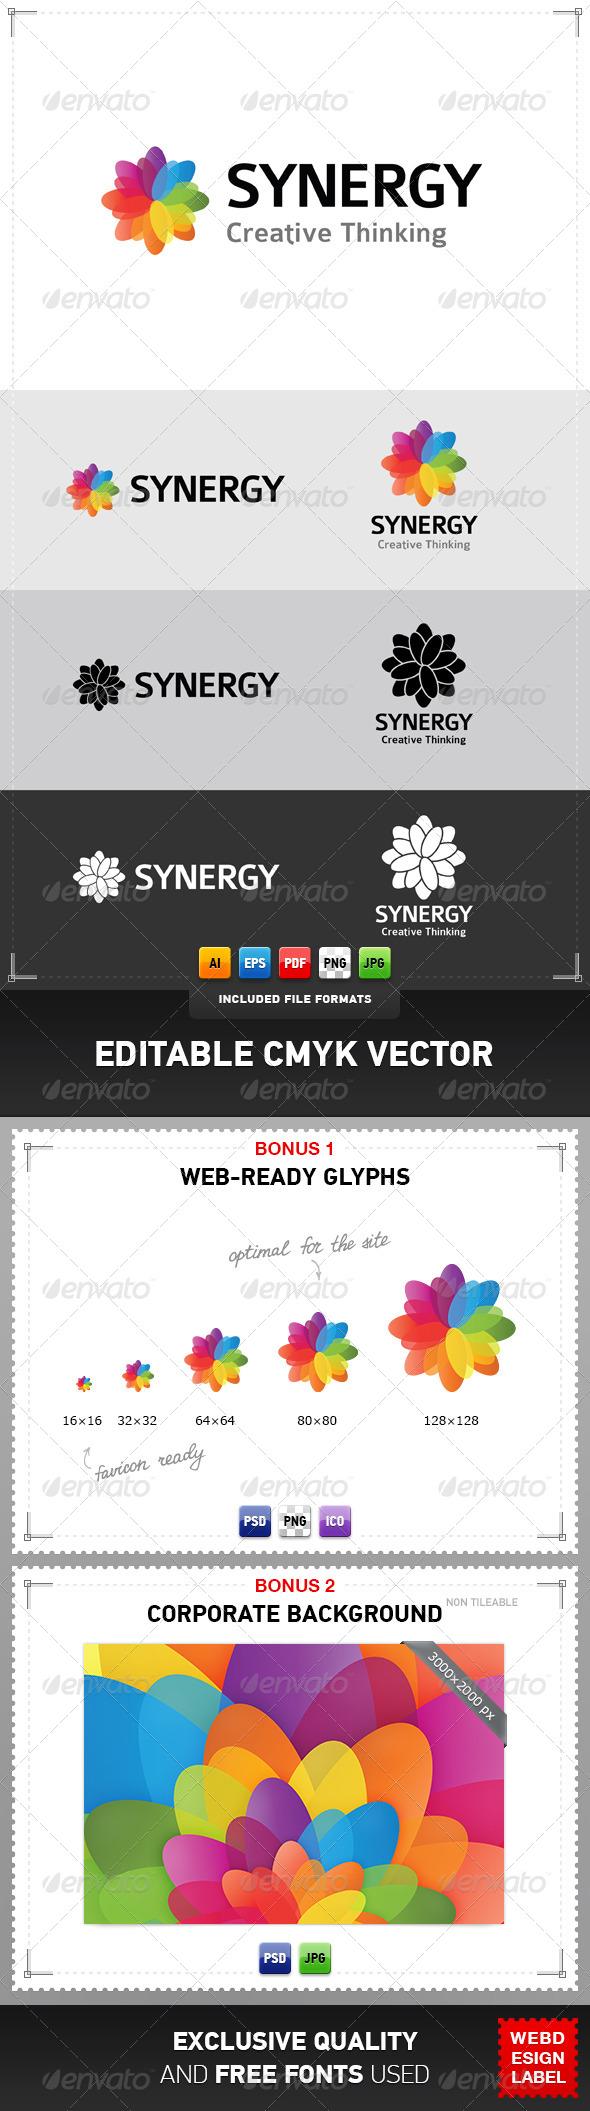 Synergy Logo - Abstract Logo Templates